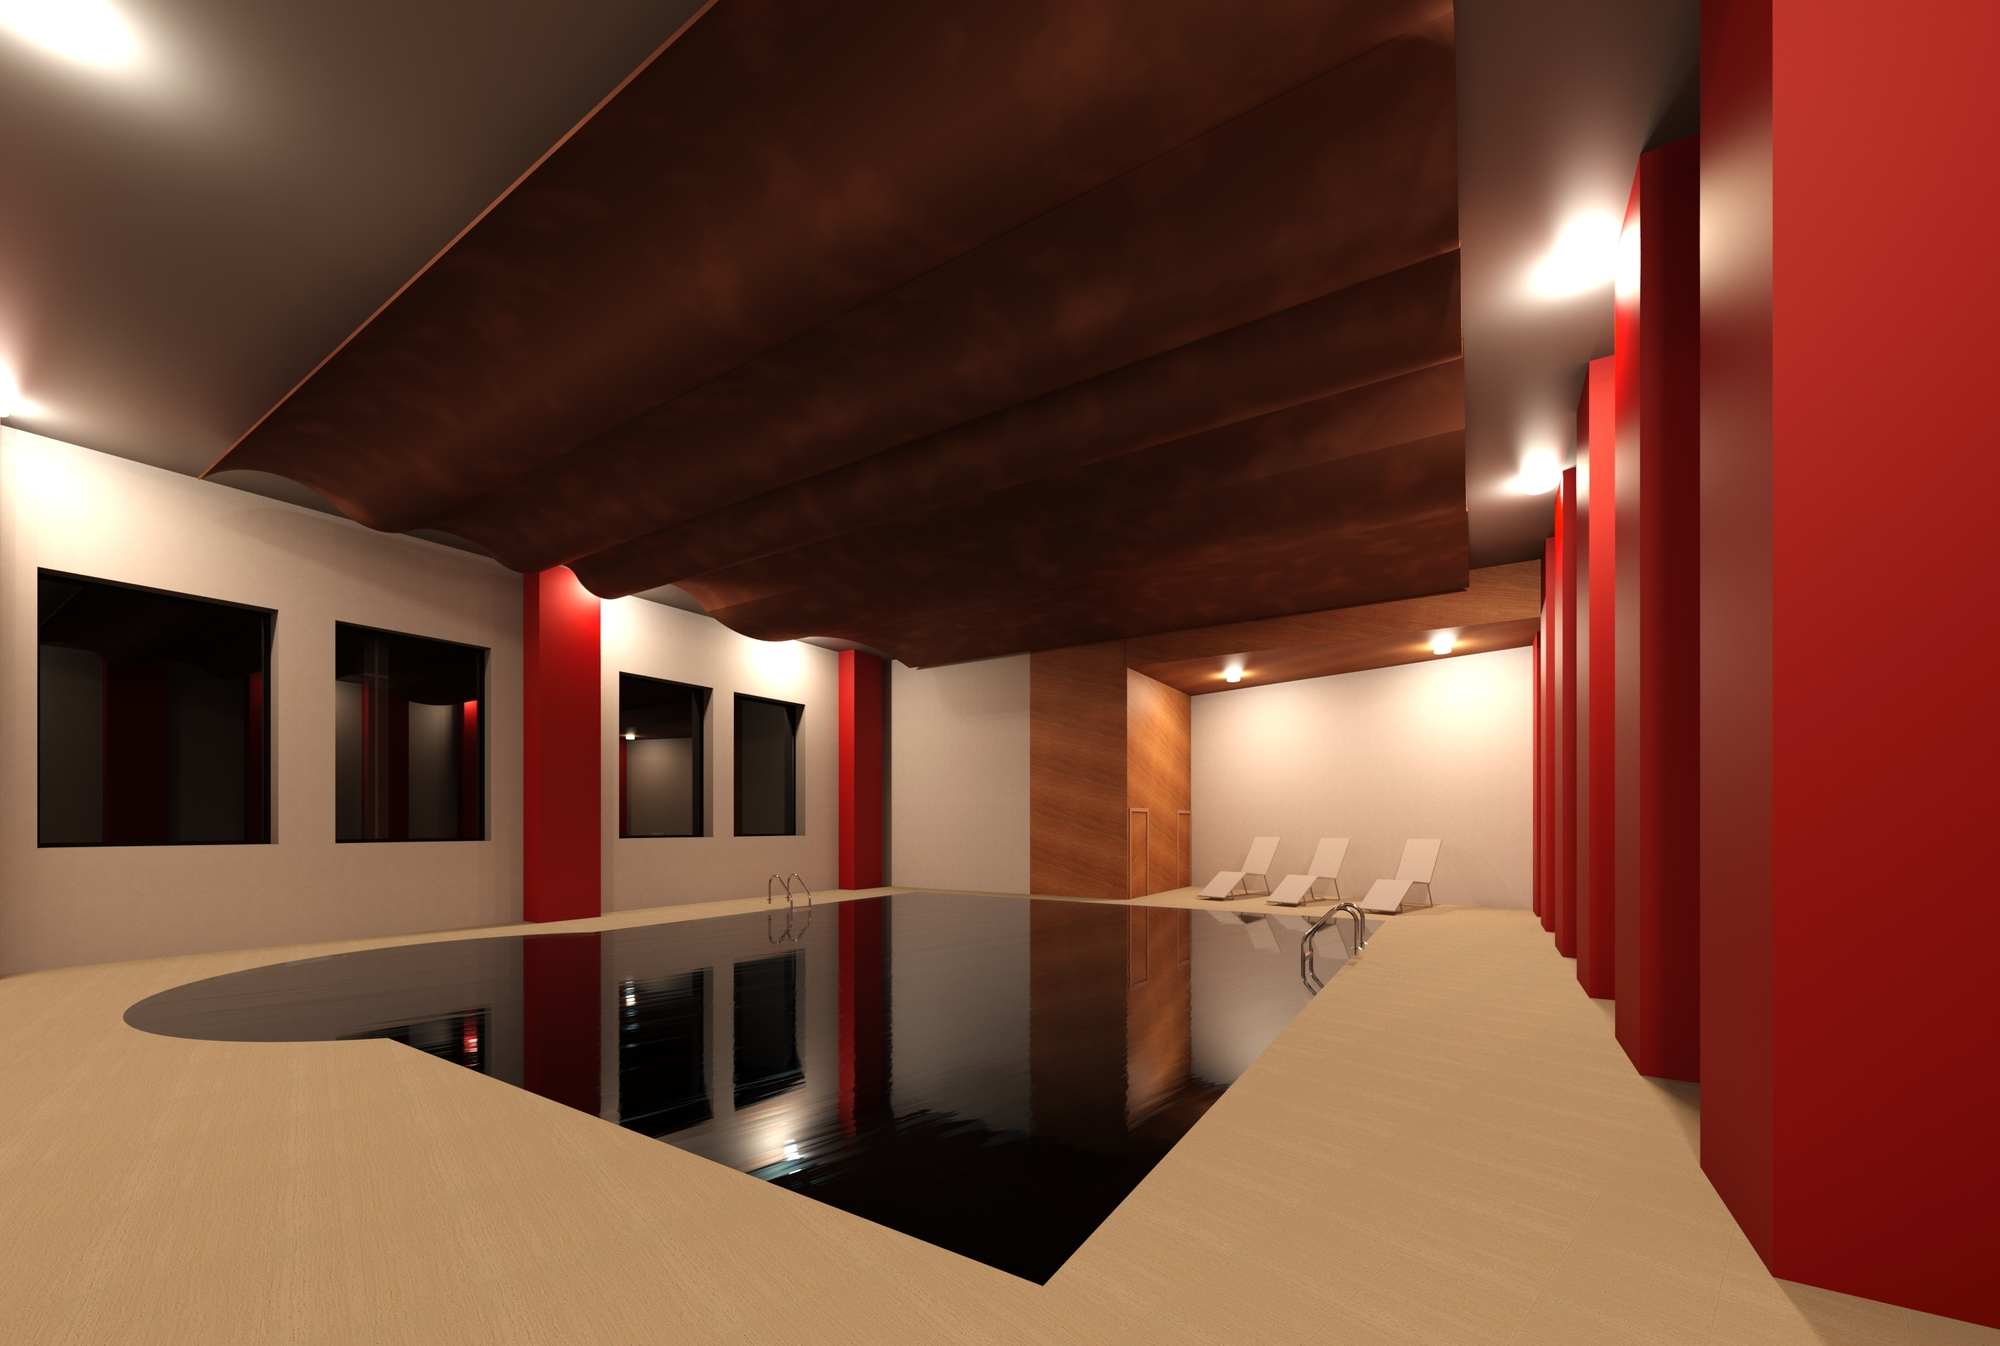 Raas-rendering20150226-4453-1wrvlx1